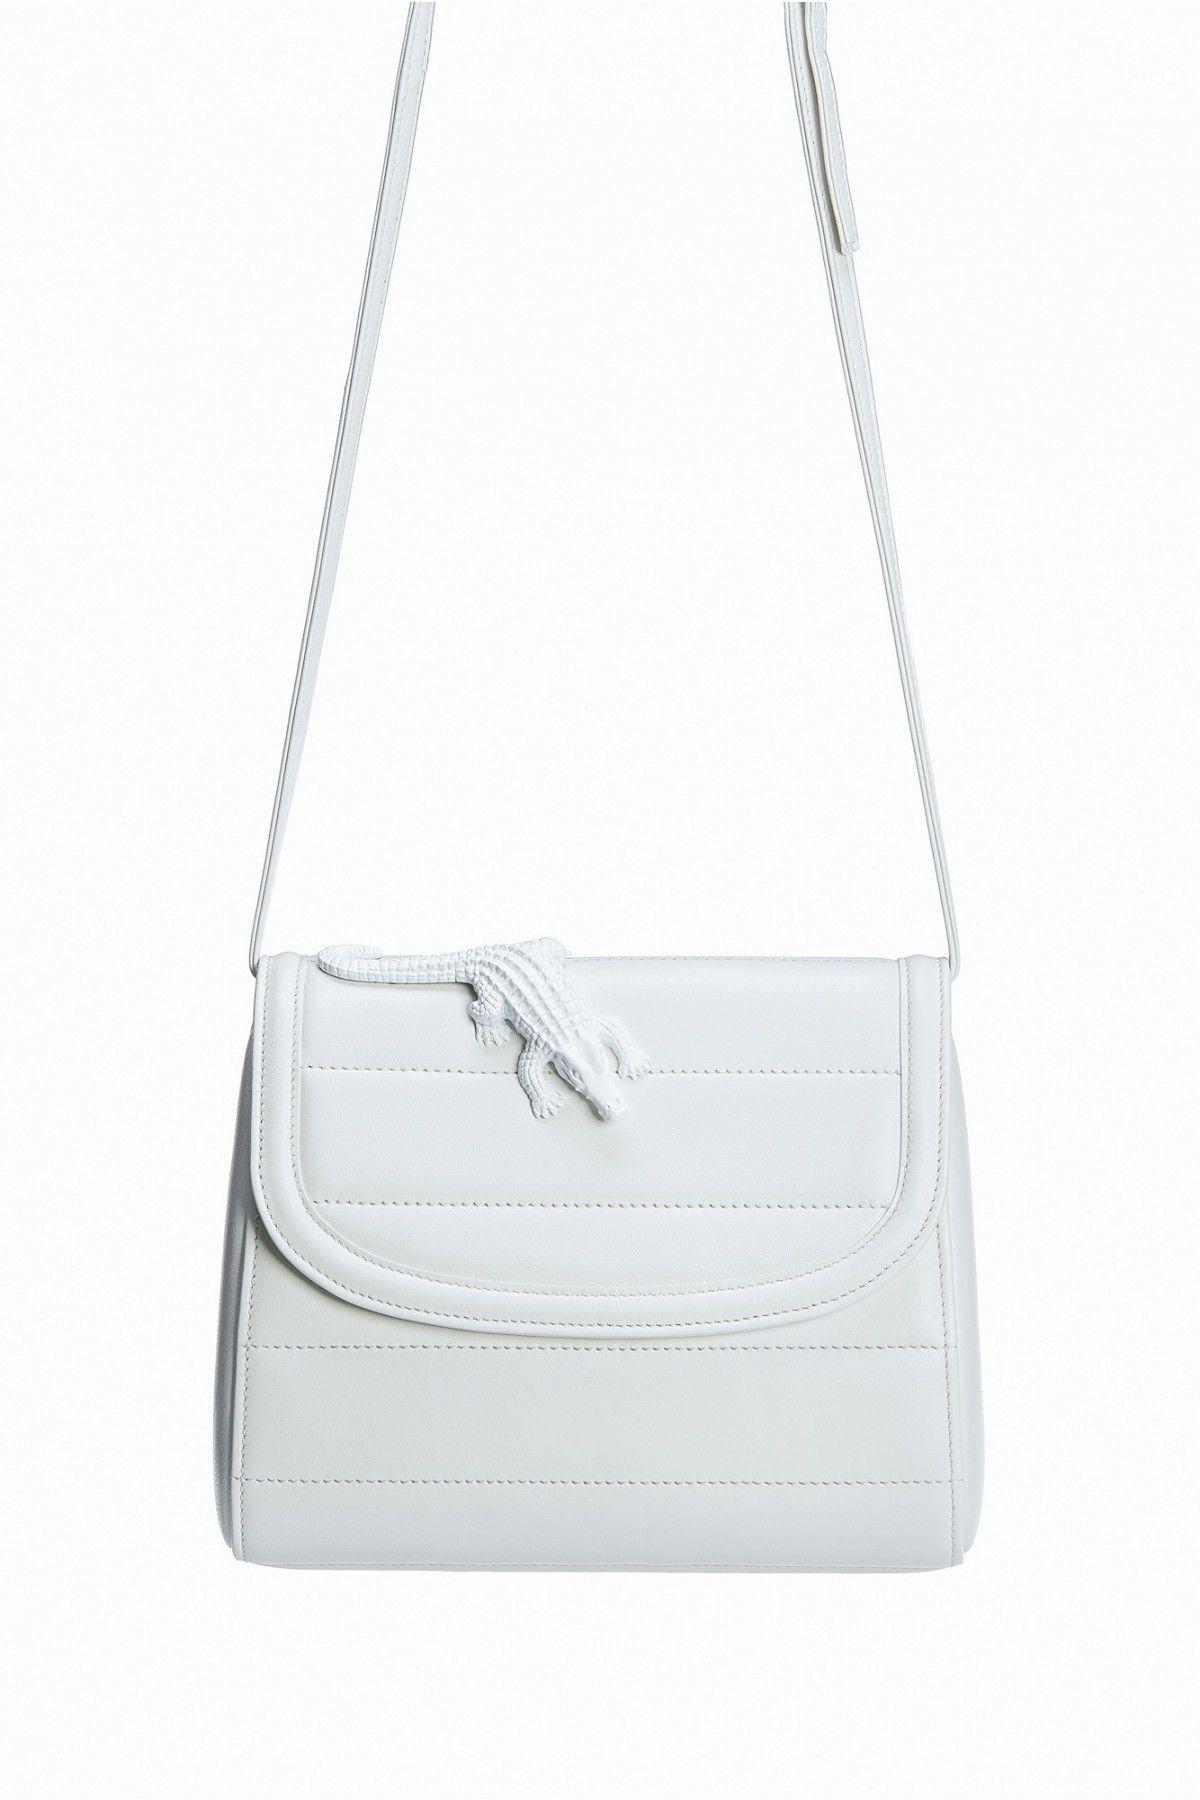 f1e4cc5af84 amelie pichard white leather bag   Wish List   Bags, Lambskin ...